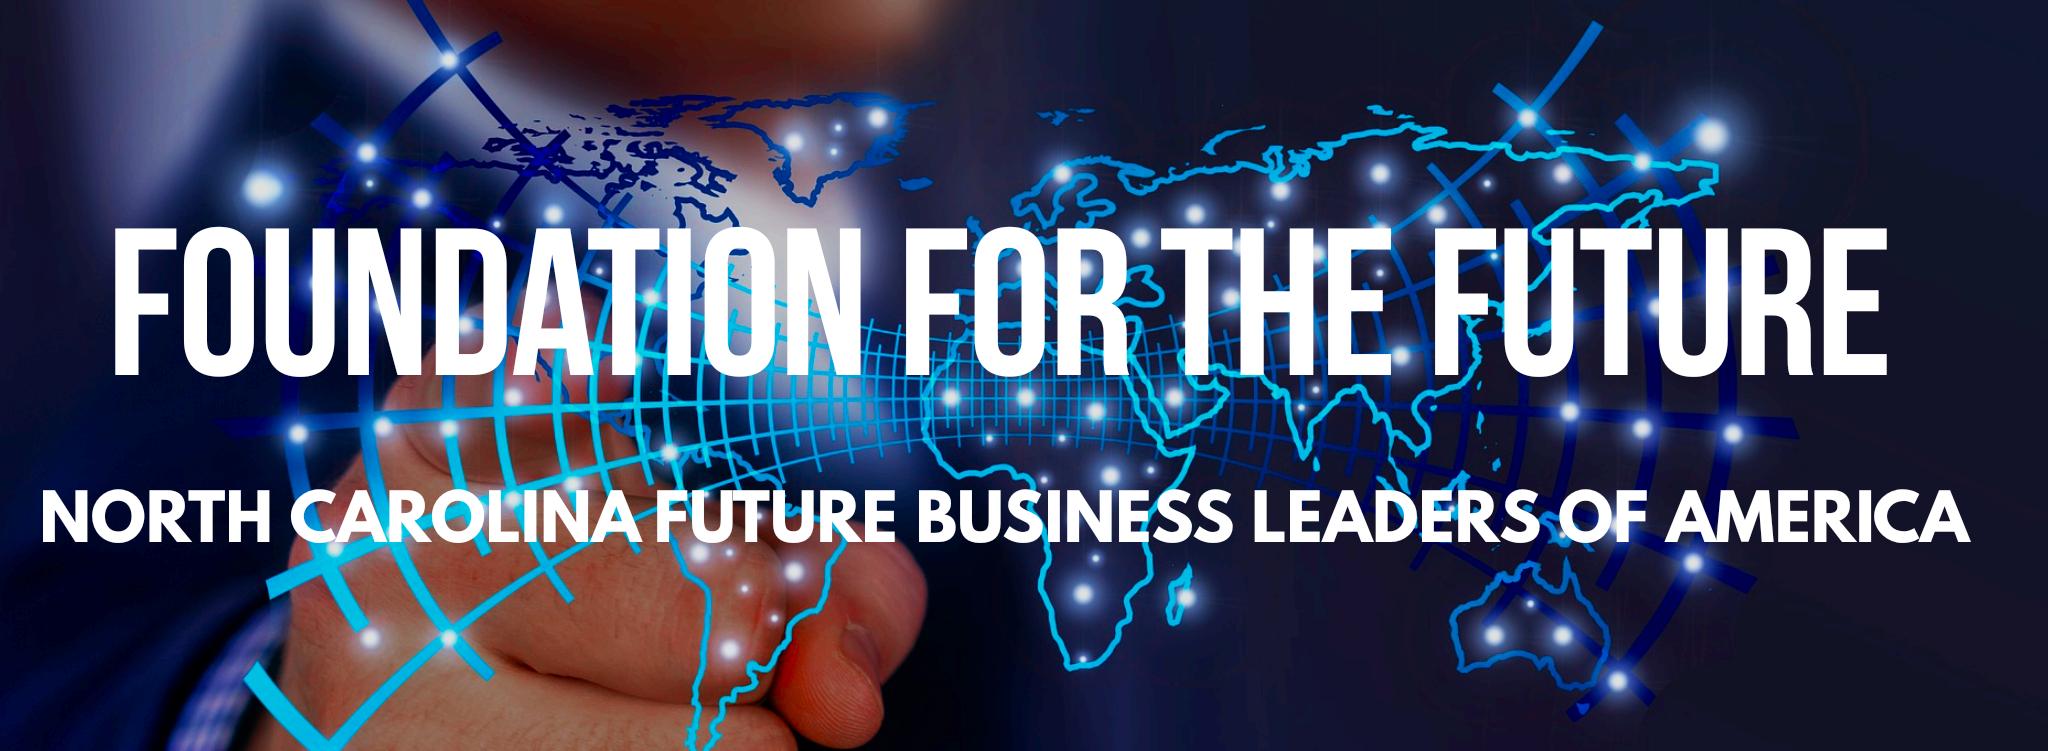 North Carolina Future Business Leaders of America